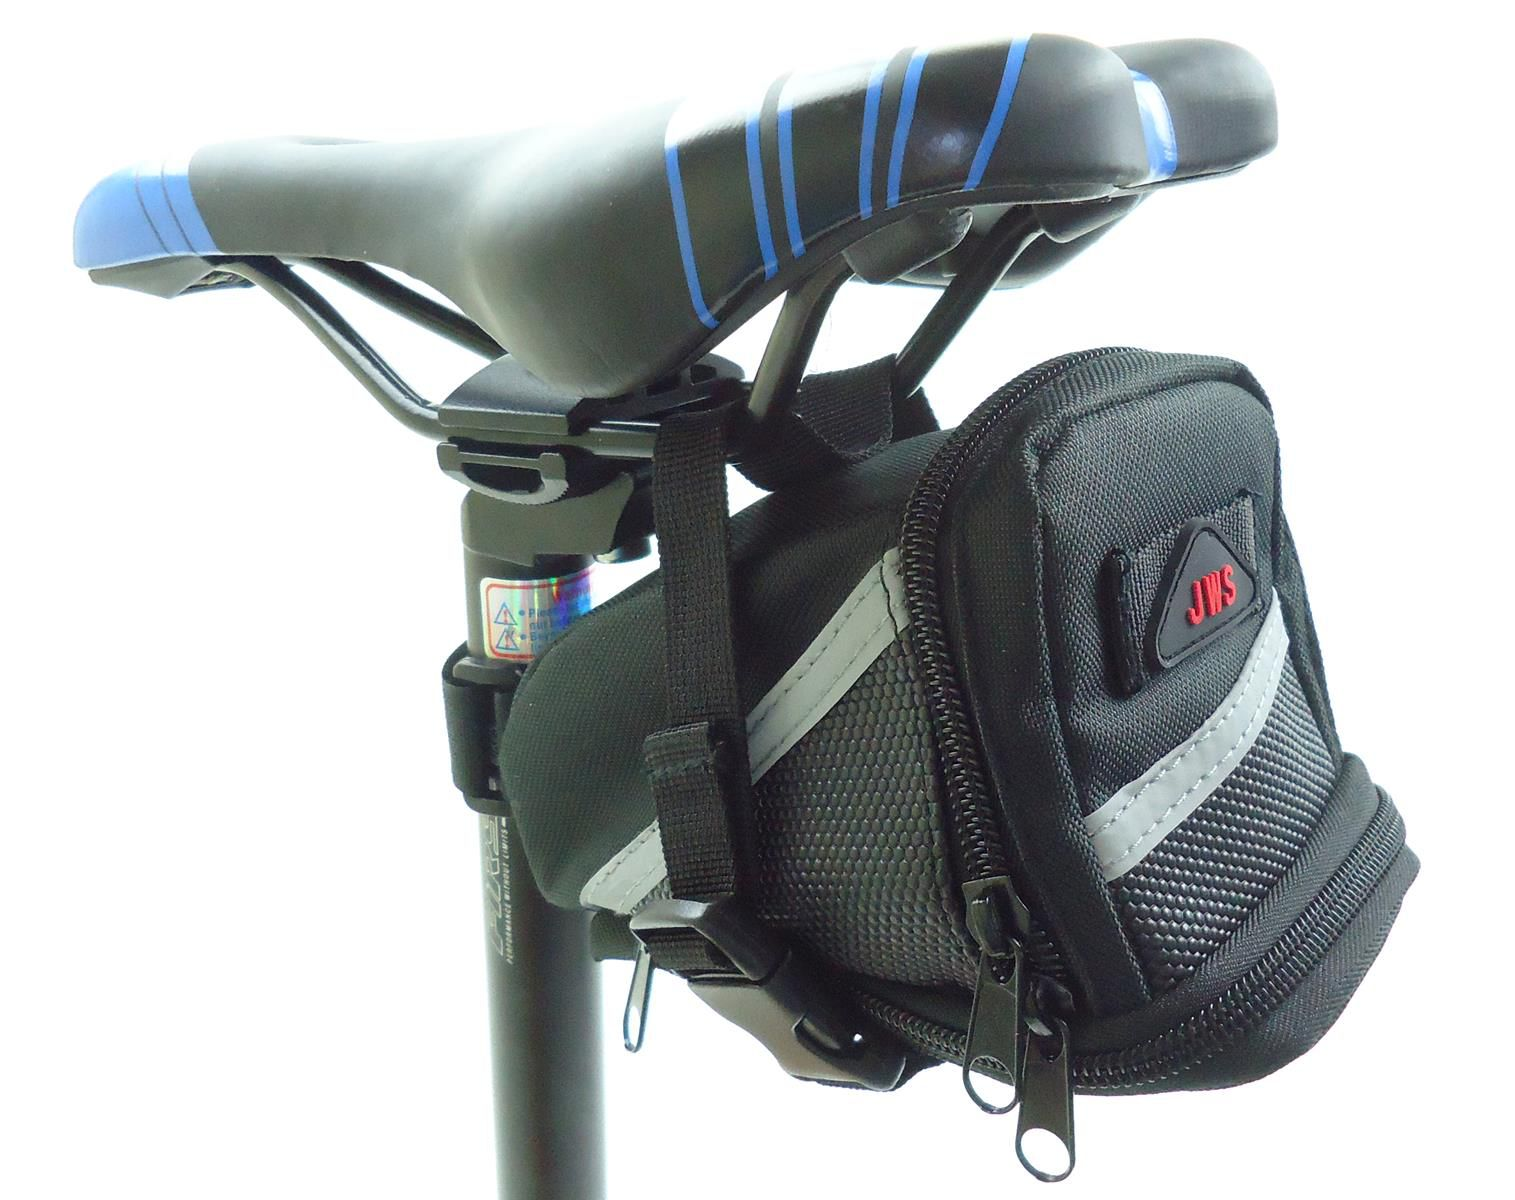 Bolsa de Banco Selim para Bicicleta JWS WS-288 Para Ferramentas e Acessórios Cor Preta